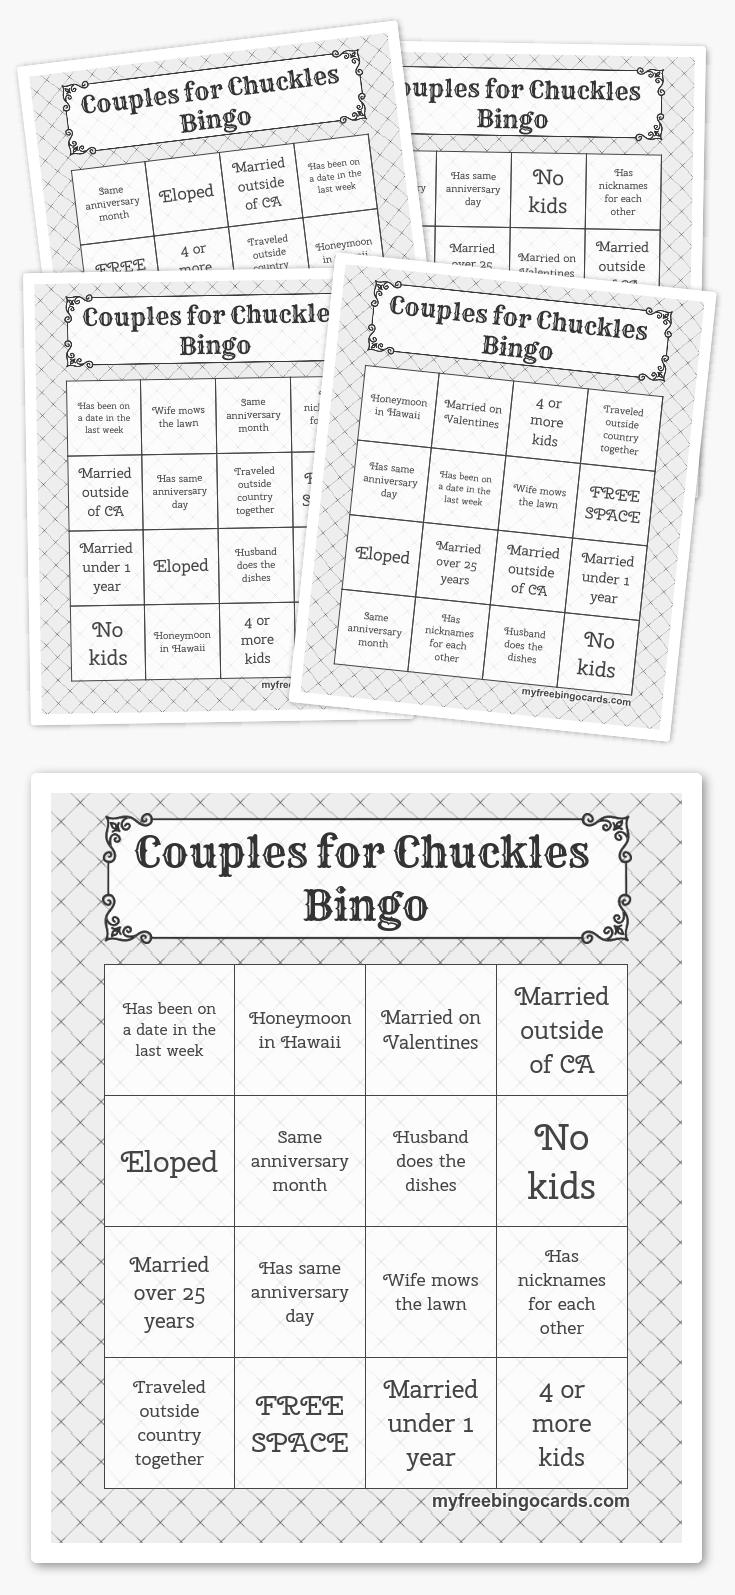 Couples For Chuckles Bingo | Free Printable Bingo Cards